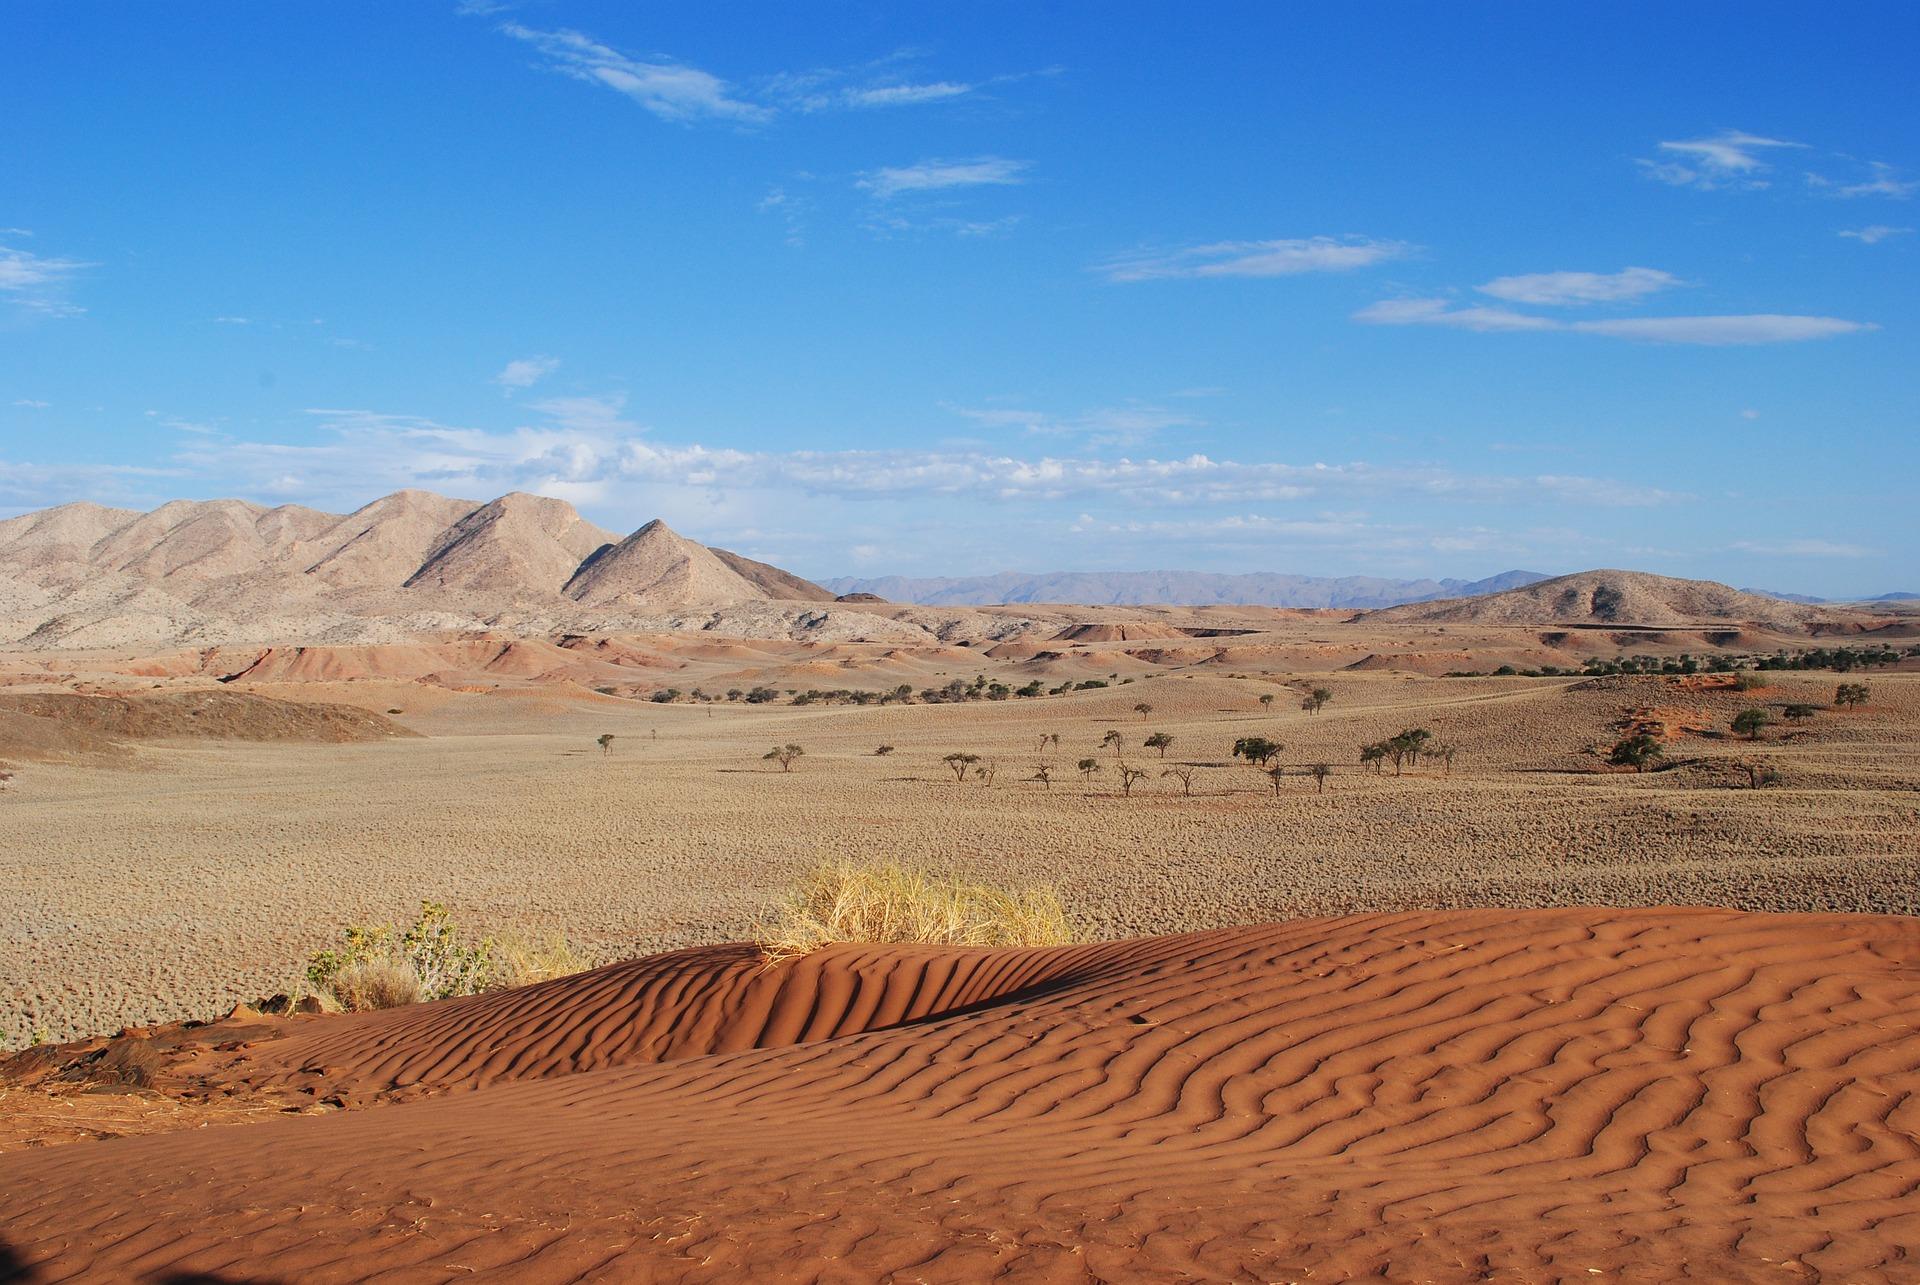 Namibia Selbstfahrer Safari: Plane deine Route und tanke immer voll!